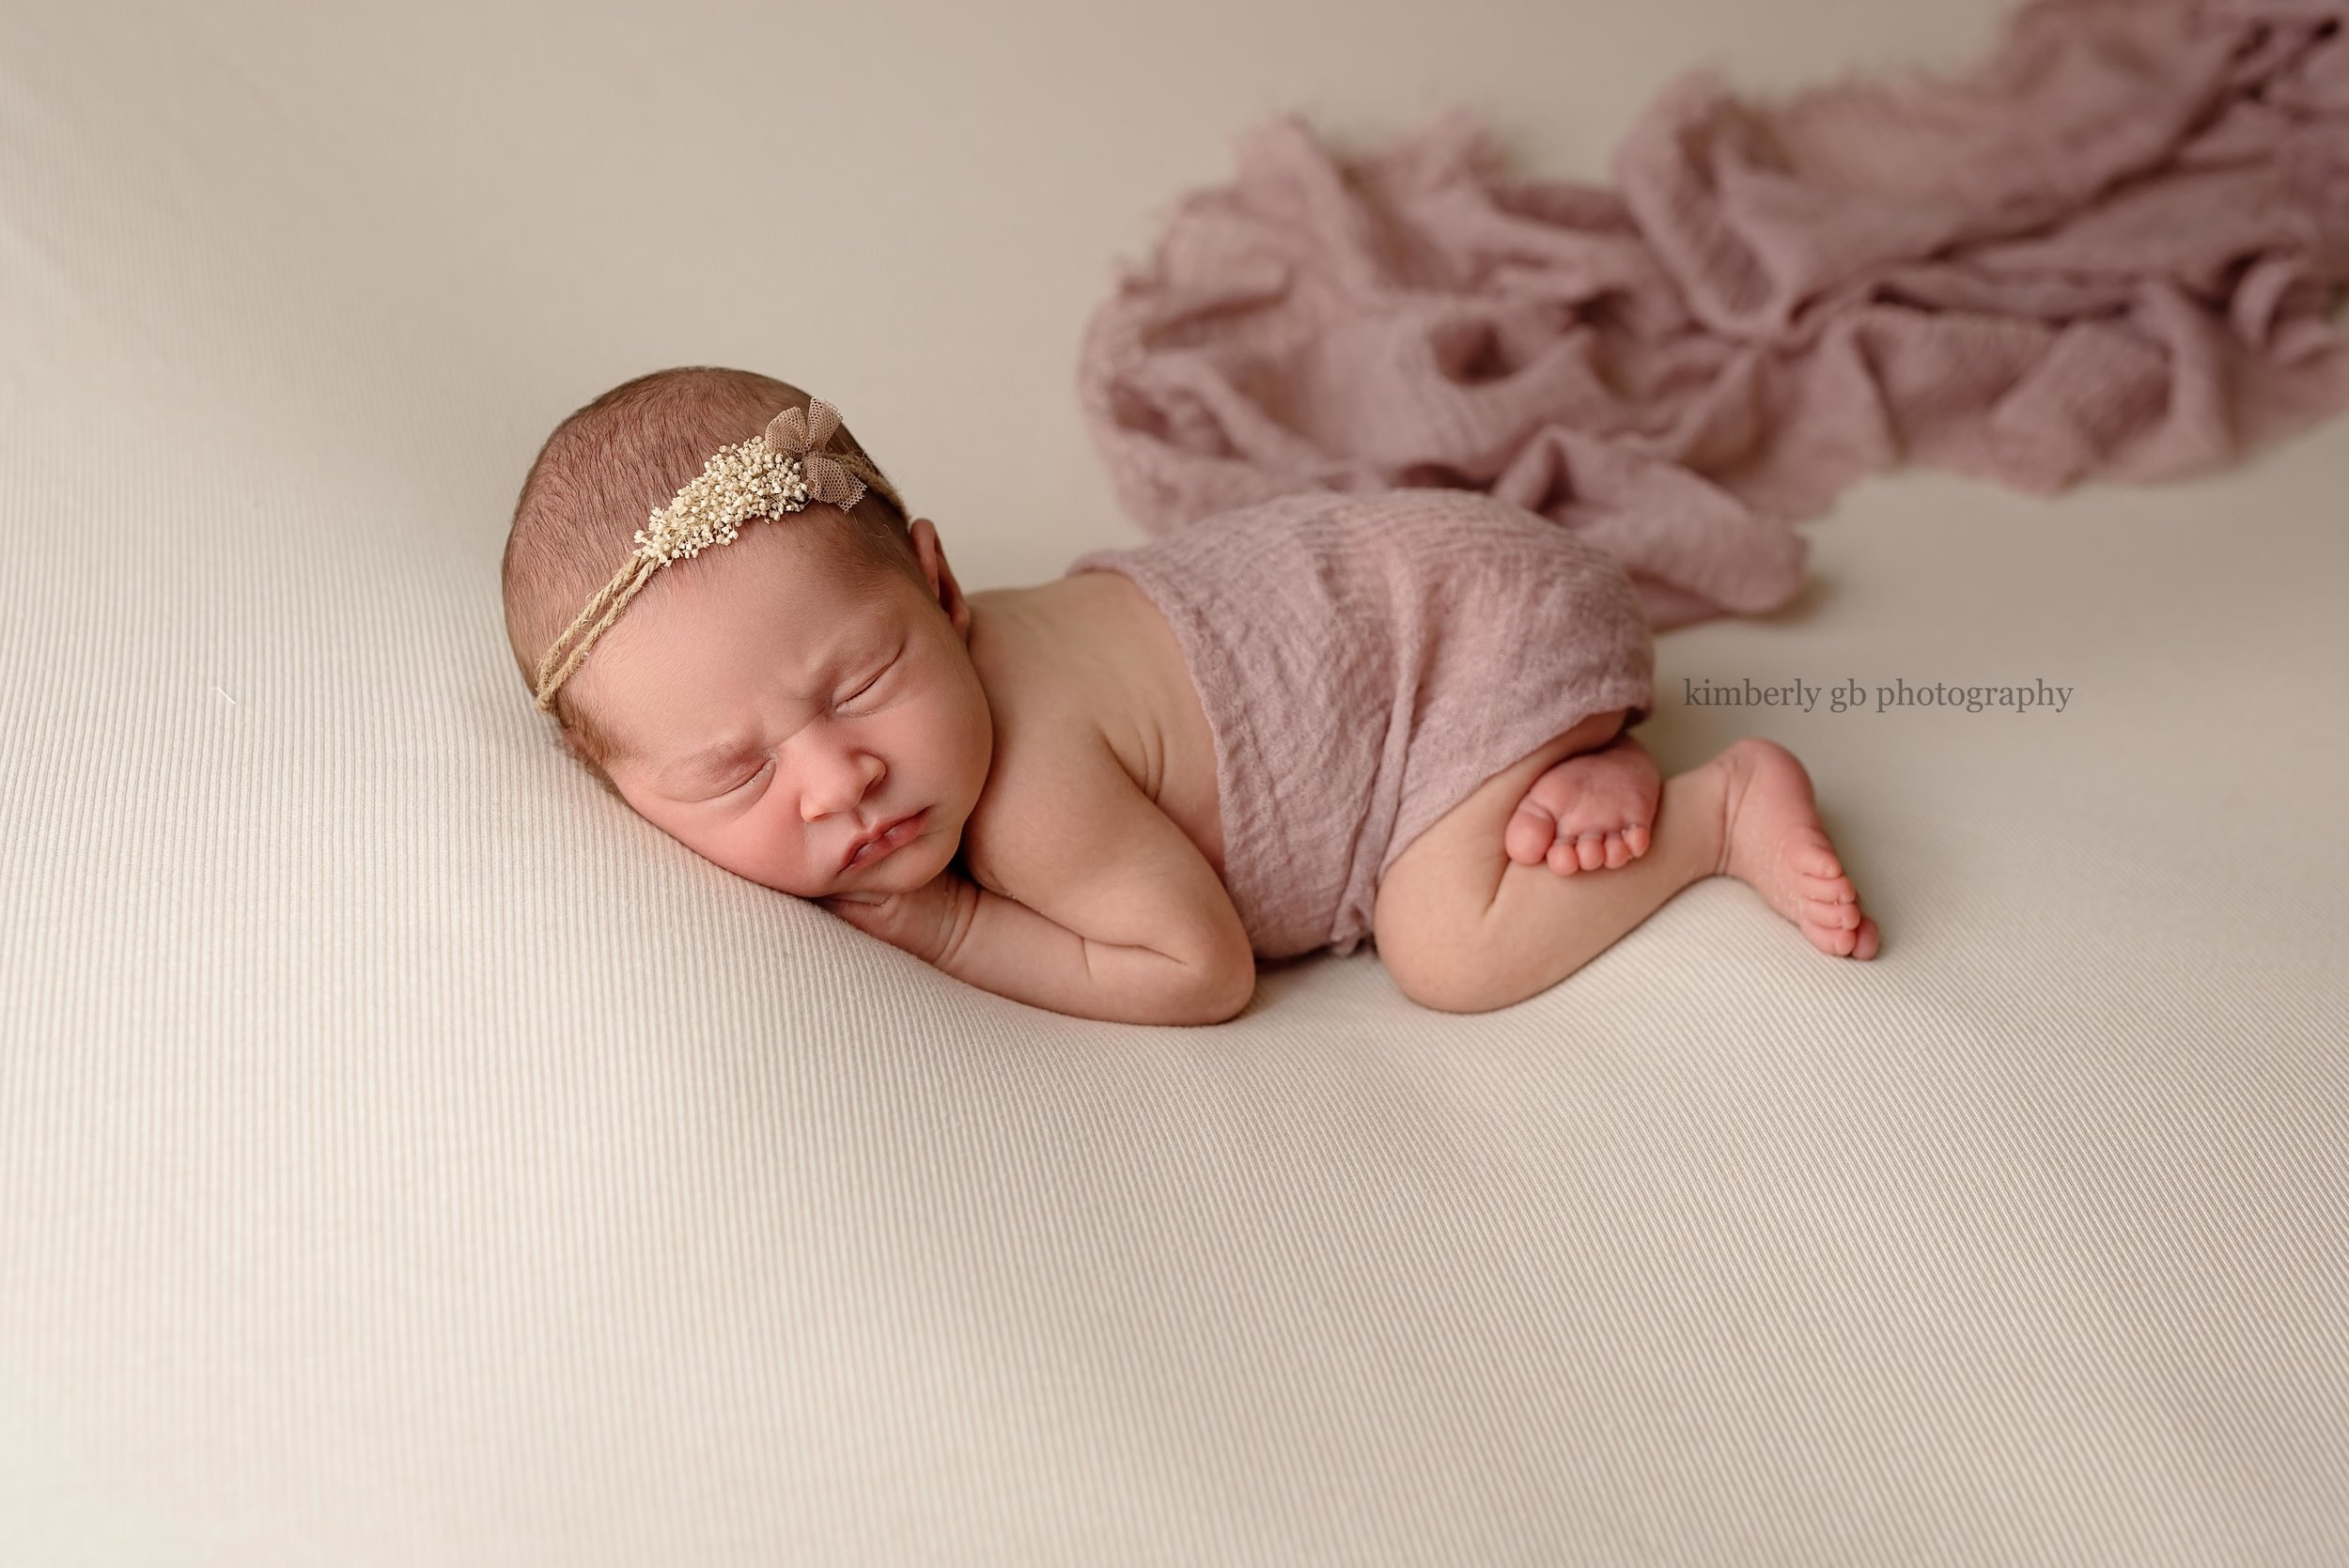 fotografia-de-recien-nacidos-bebes-newborn-en-puerto-rico-kimberly-gb-photography-fotografa-293.jpg